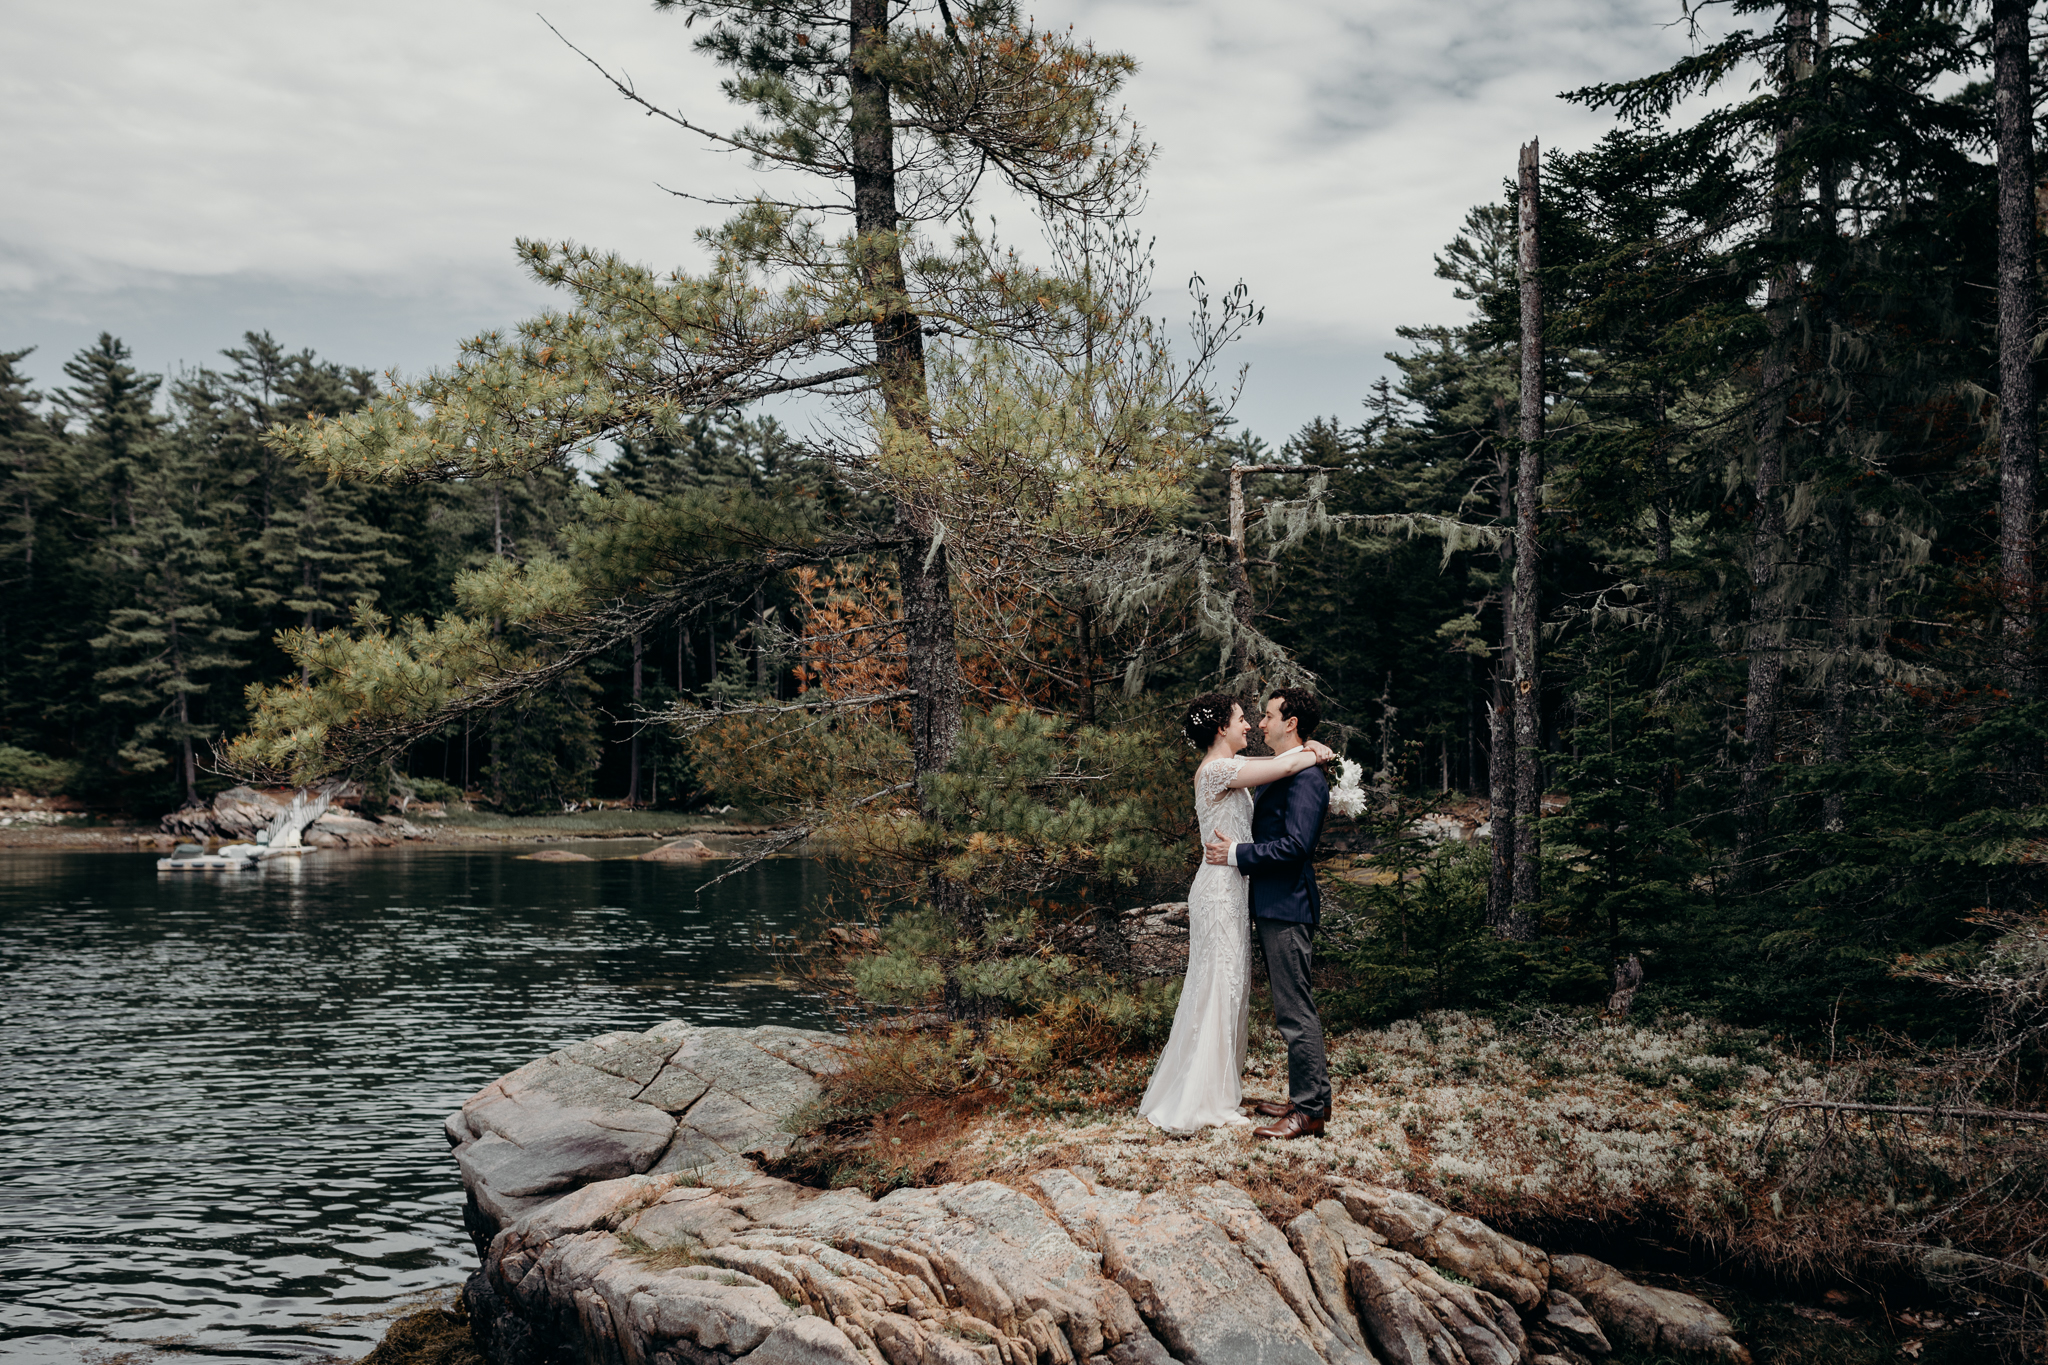 erinwheatco-9172 Maine Wedding by the Sea | Ruth & Ryan